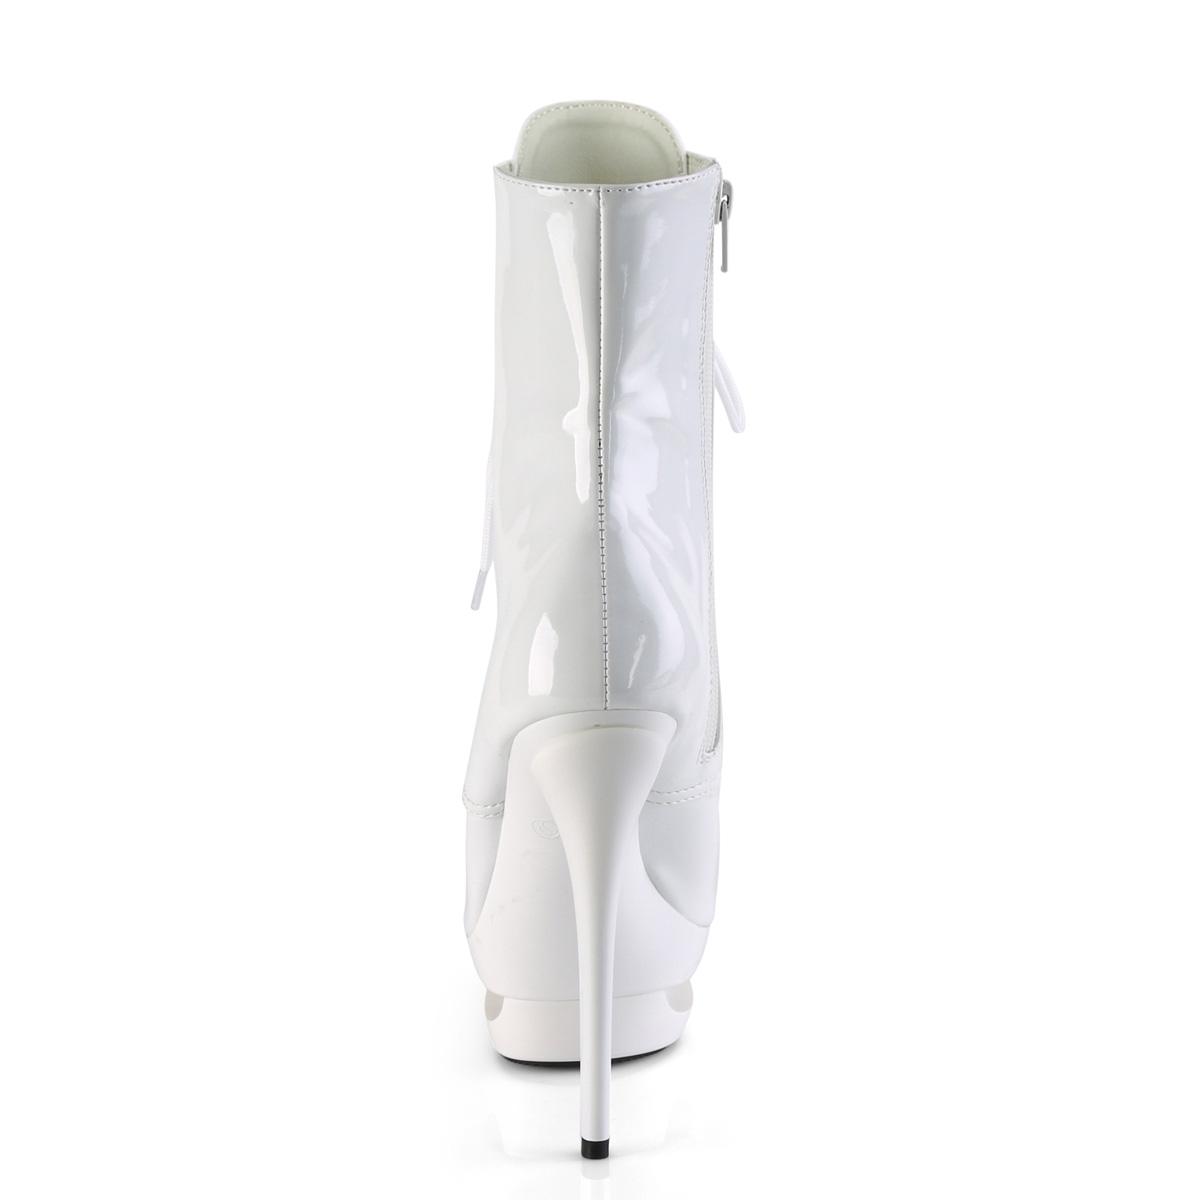 Pleaser(プリーザー) BLONDIE-R-1020 厚底ショートブーツ ピンヒール サイドジップ エナメル白 ホワイト◆取り寄せ